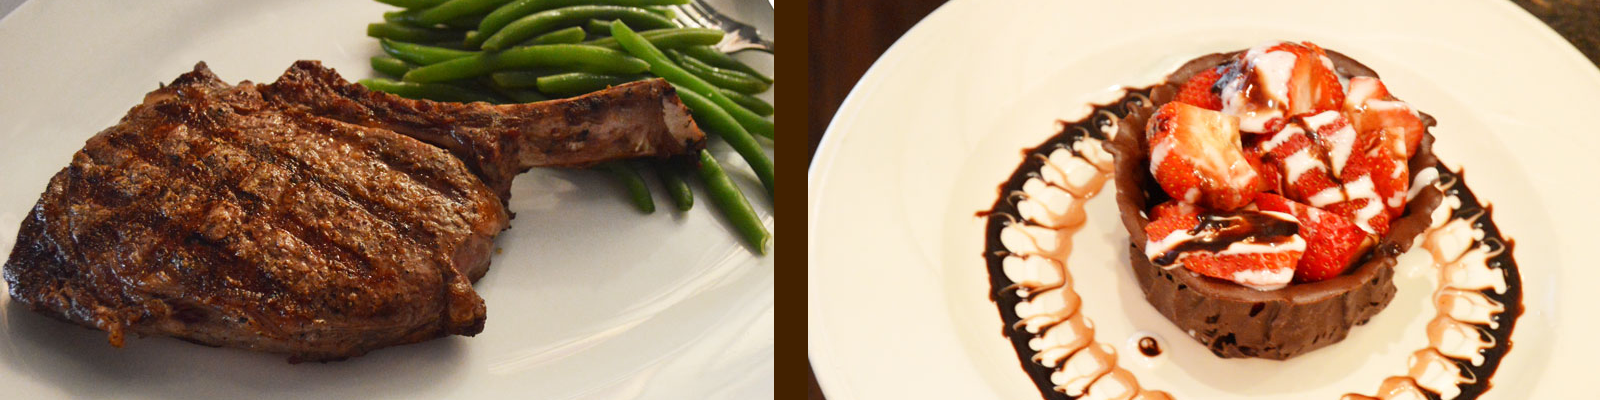 steak and chcolate dessert